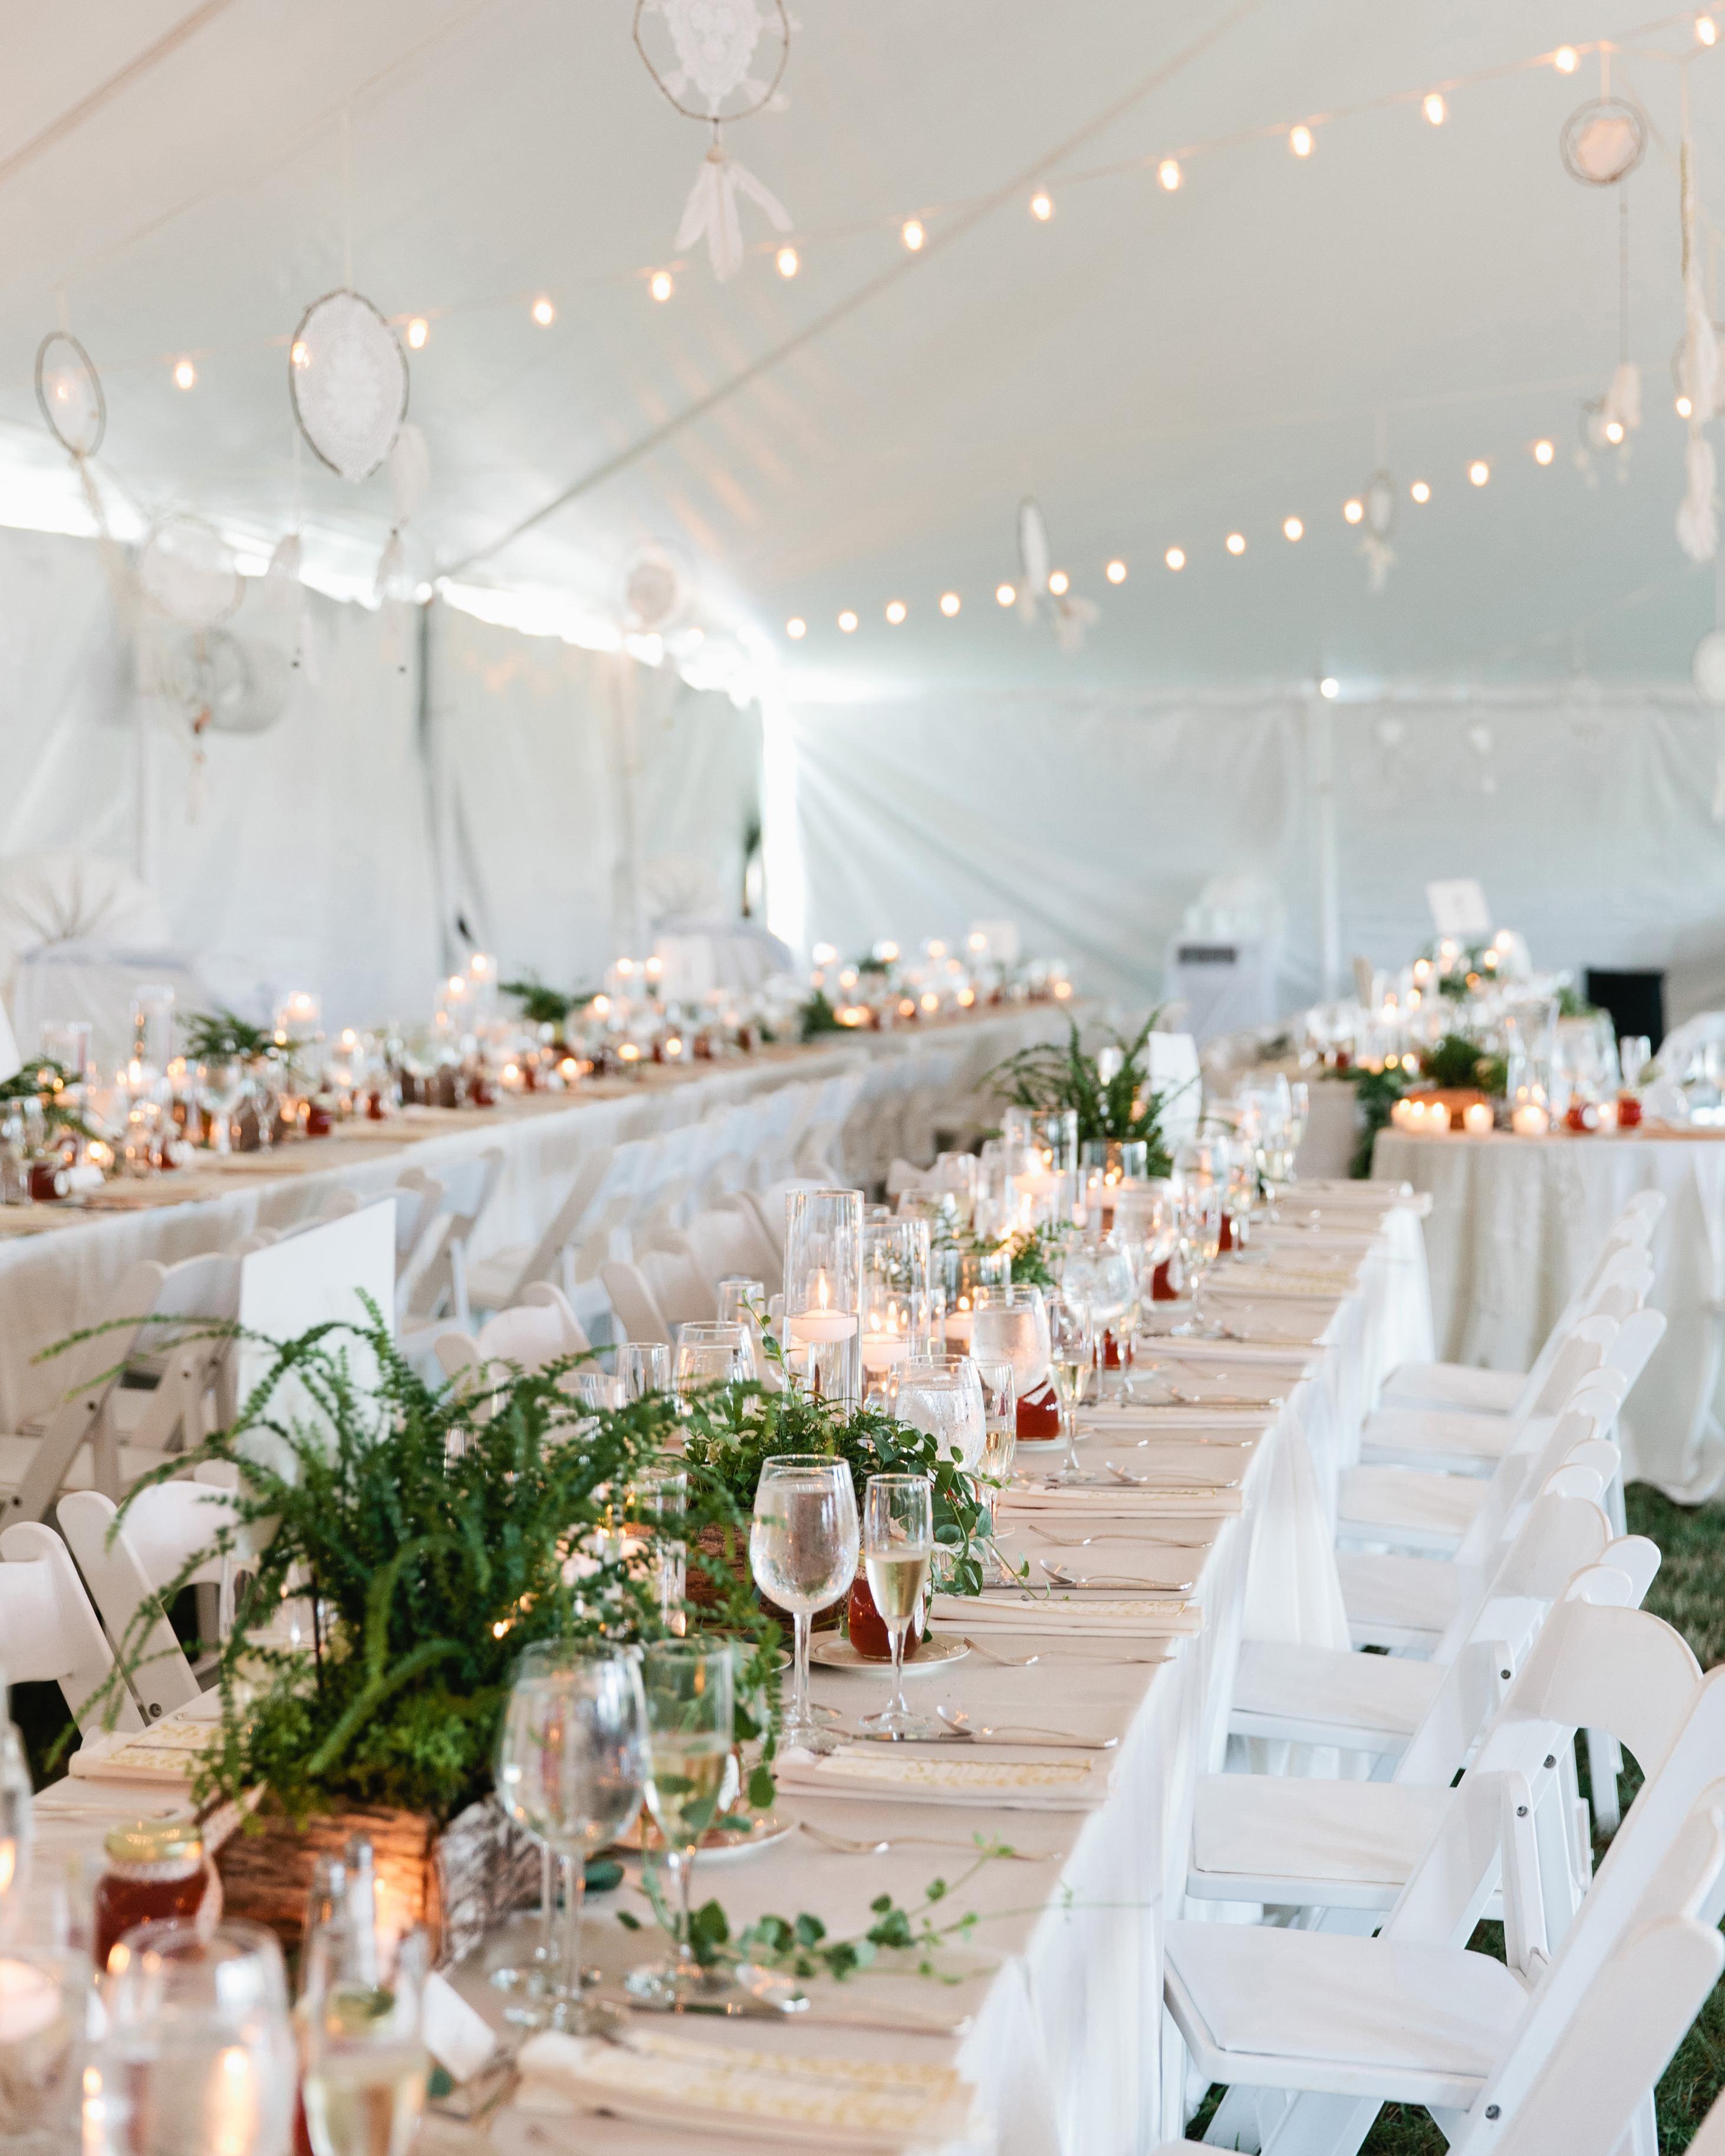 jola-tom-wedding-reception-0614.jpg